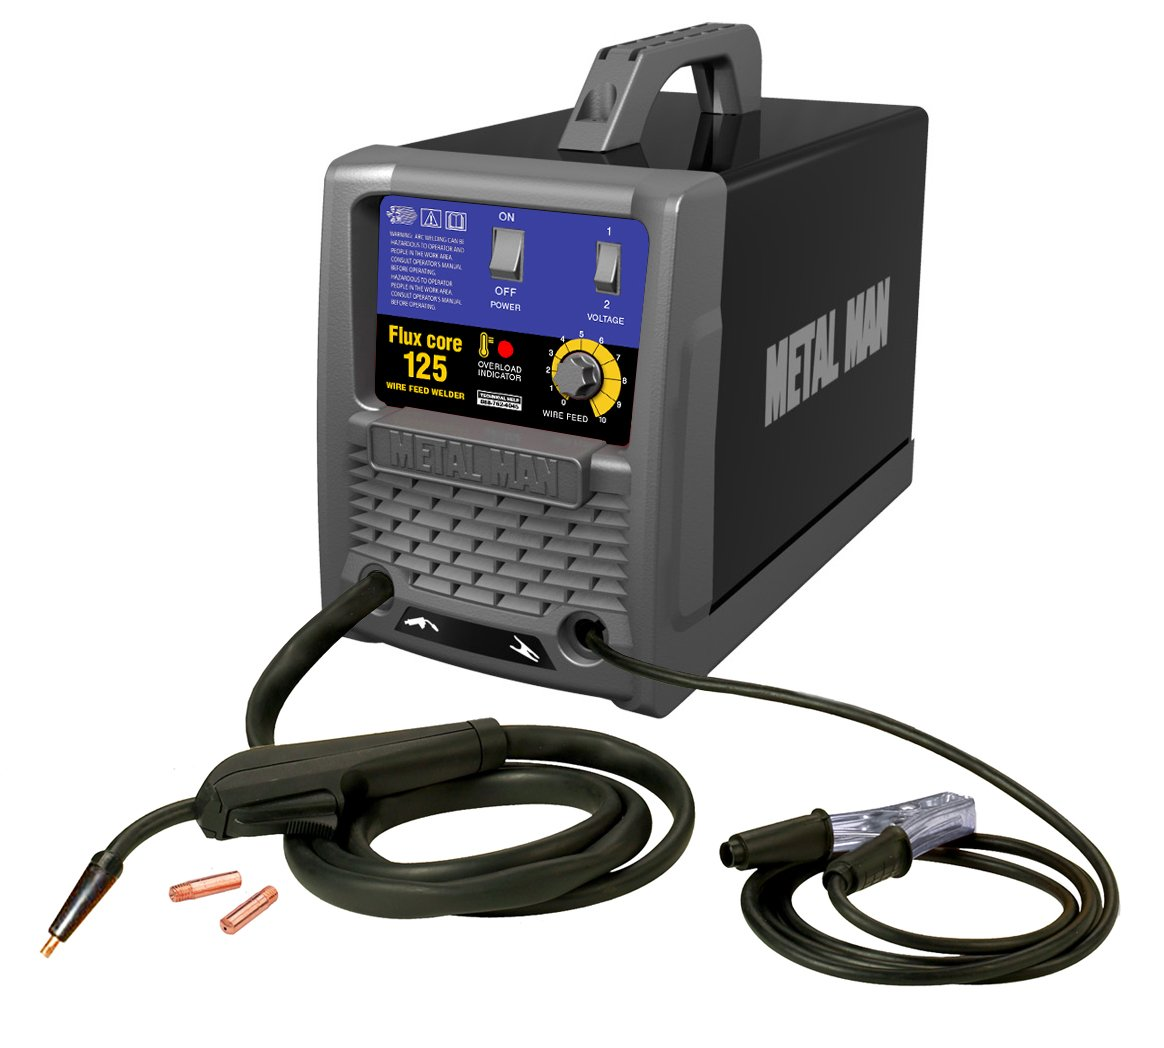 Metal Man FC125 125-Amp/115-Volt Flux Core Wire Feed Welder by Metal Man